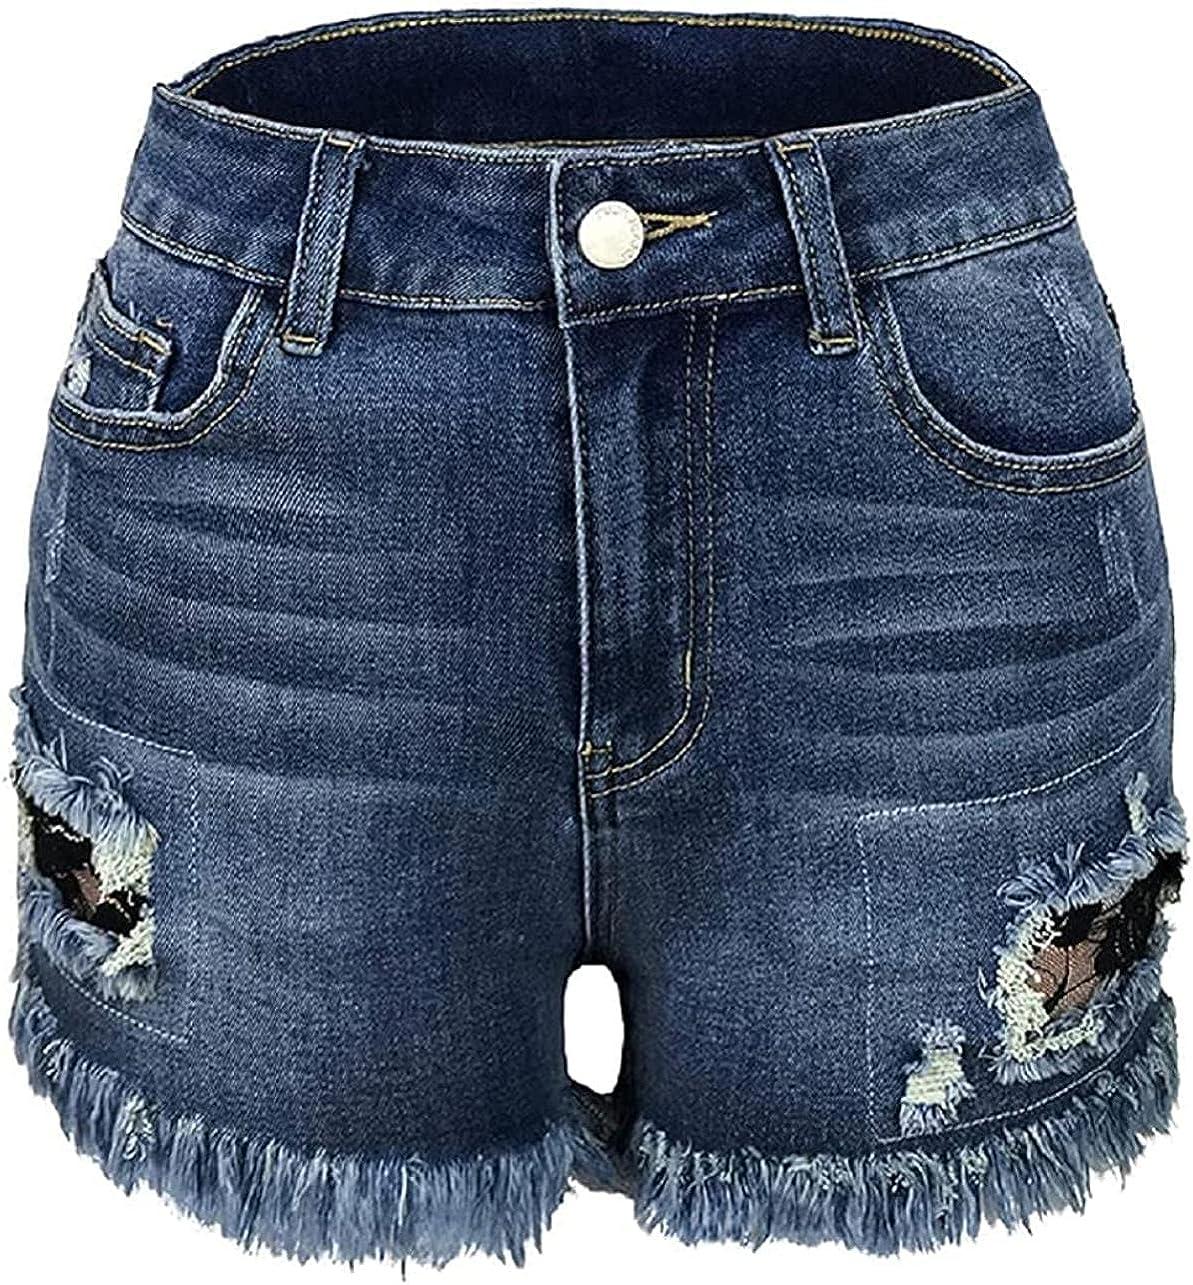 HFStorry Women's Sexy High Waist Lace Patchwork Tassel Slit Ripped Denim Shorts